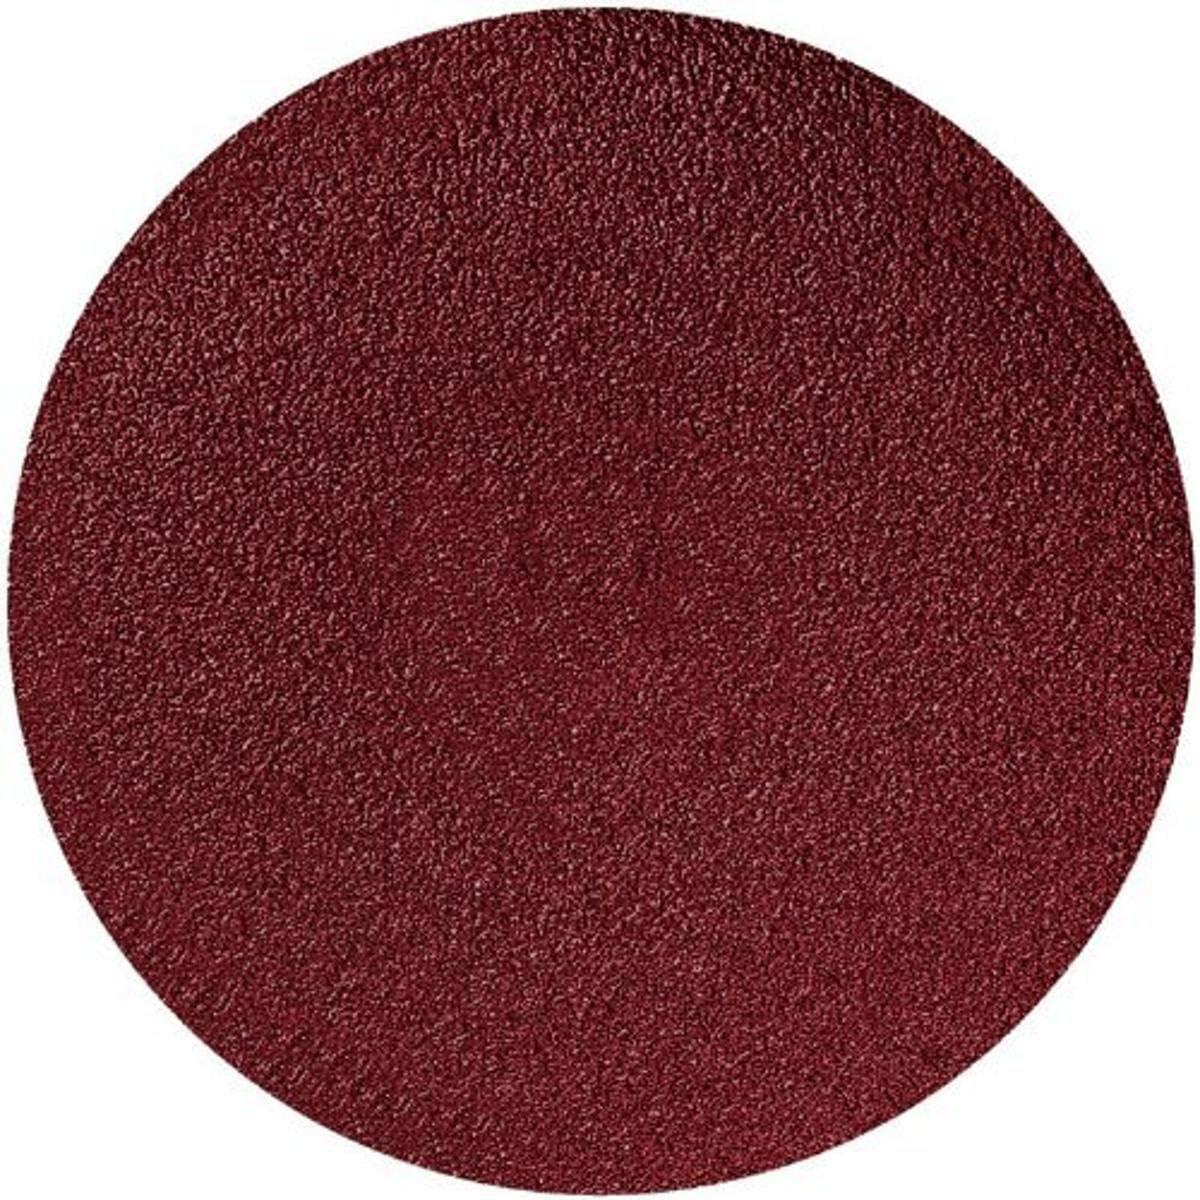 United Max 70% OFF Abrasives-SAIT 35177 Great interest 12-Inch Pressure Sensitive Adhesive